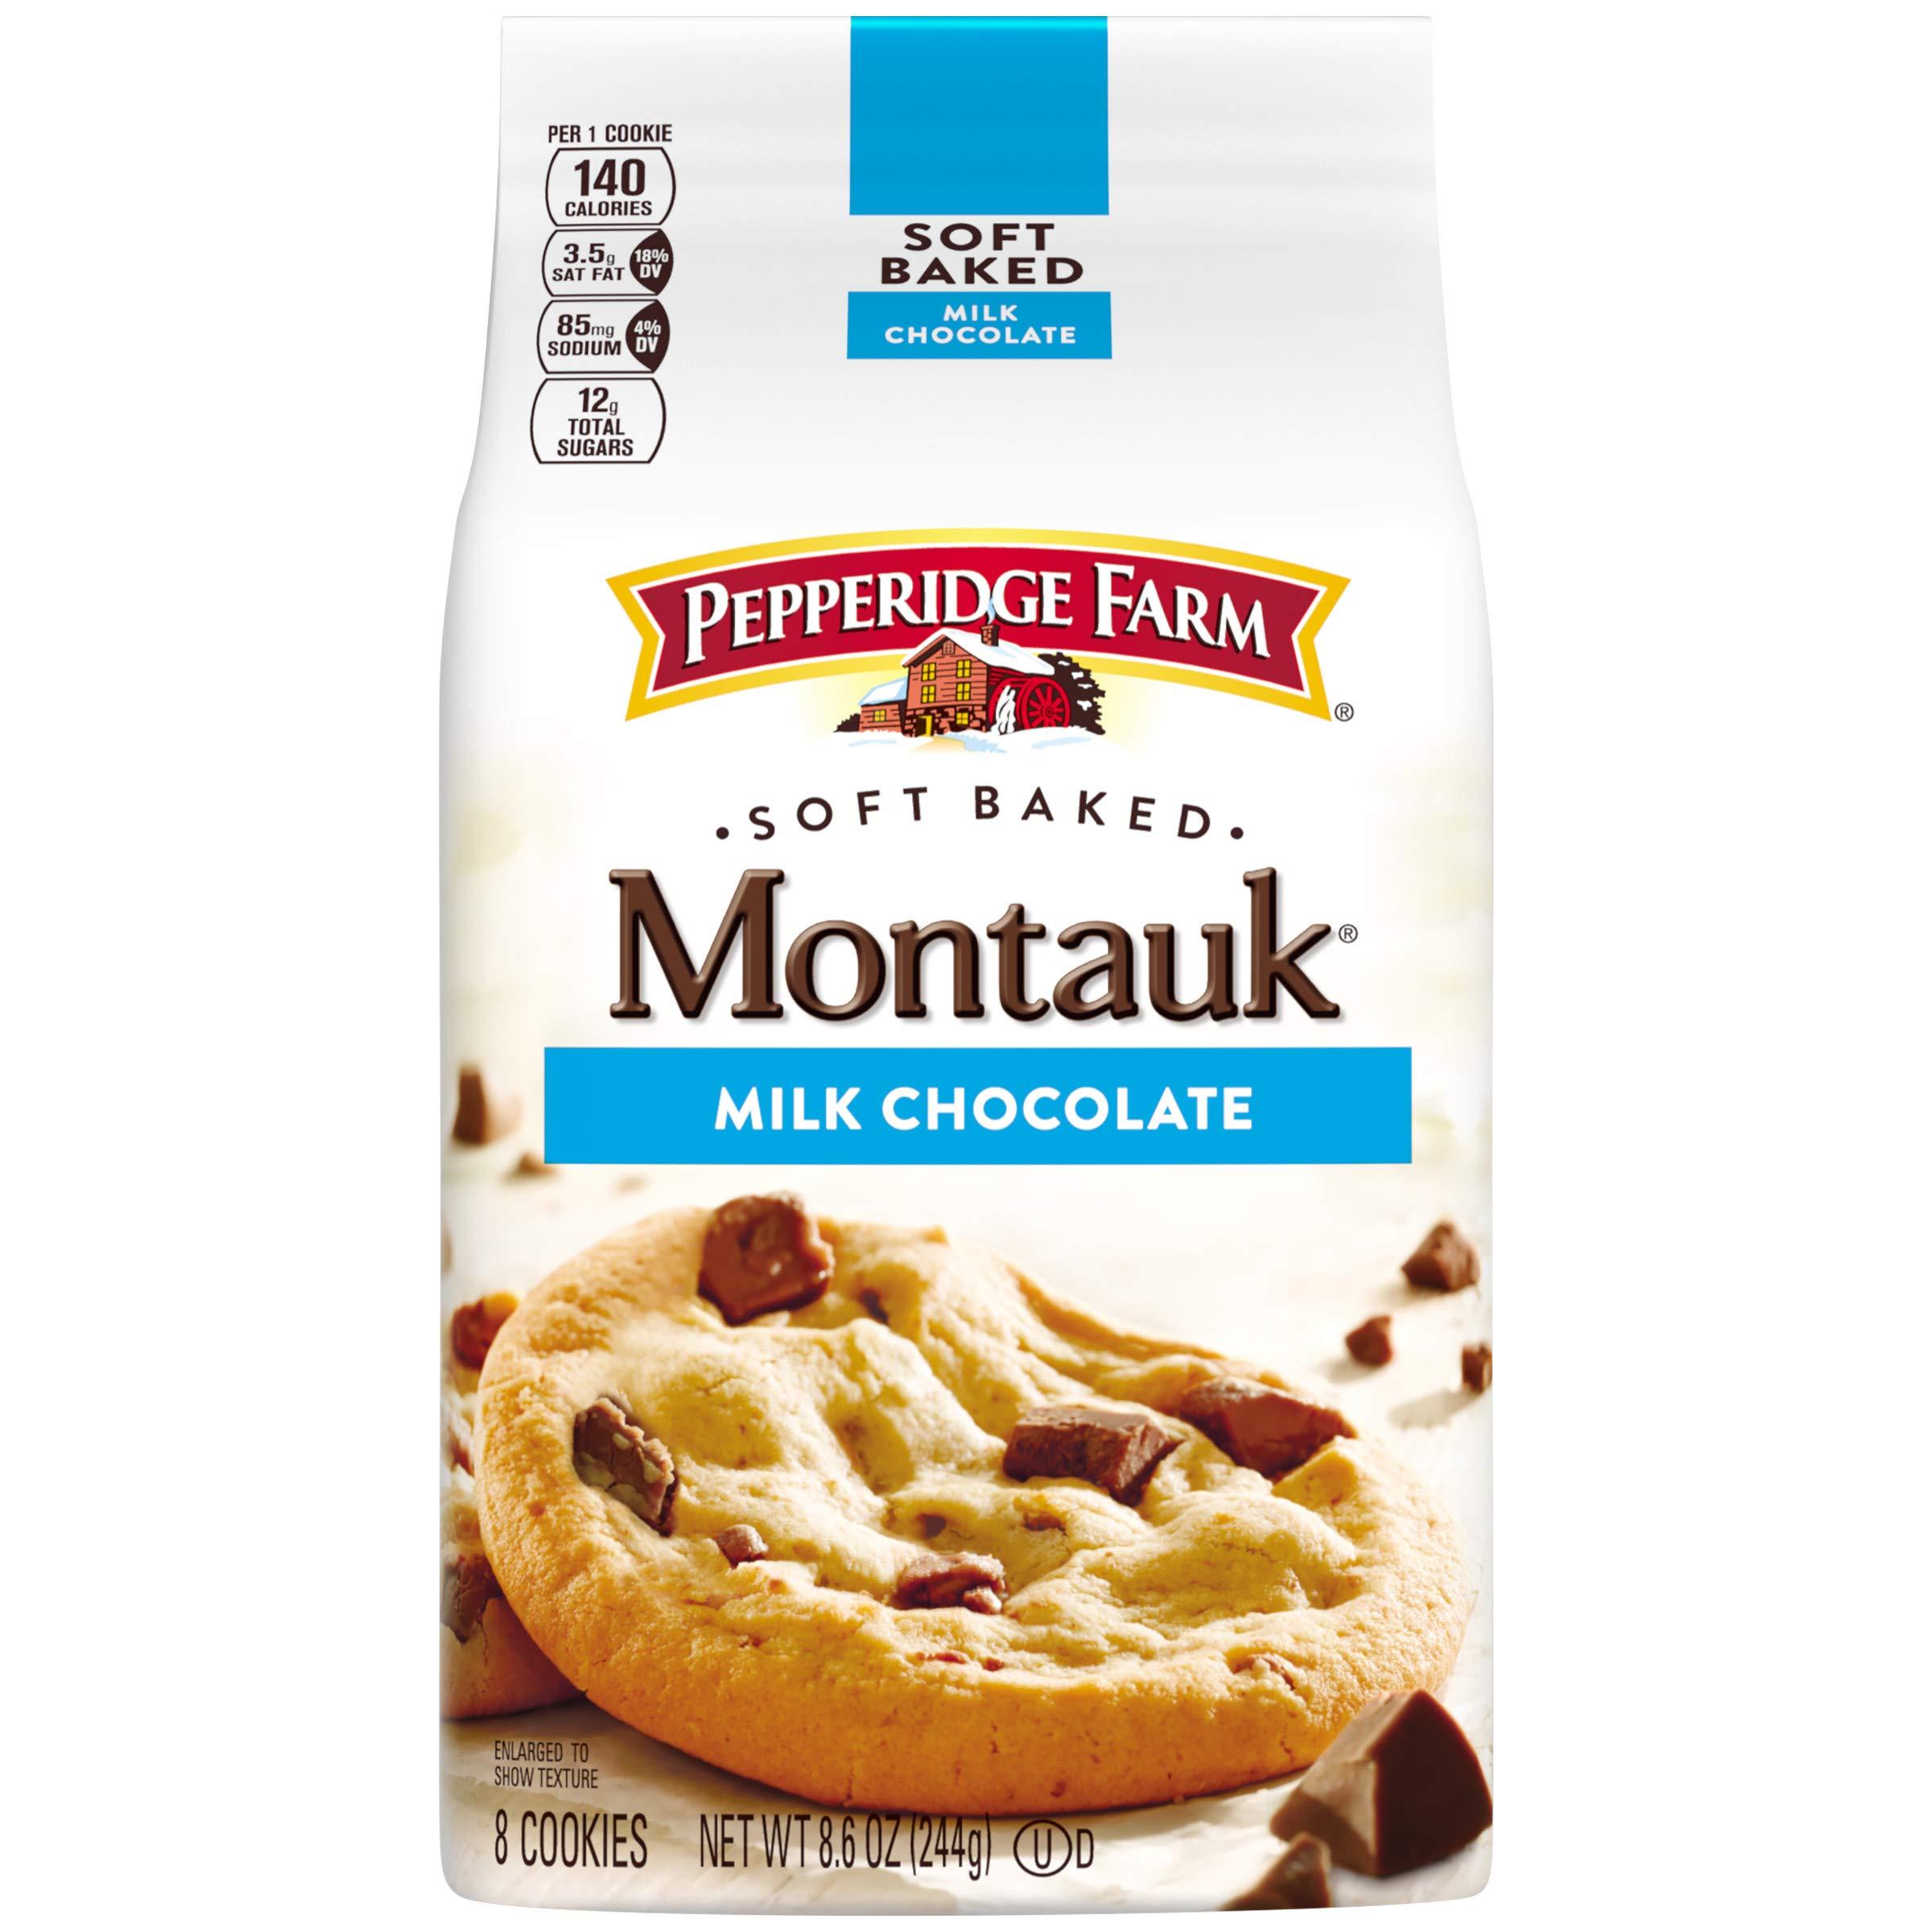 Pepperidge Farm, Montauk, Soft Baked, Cookies, Milk Chocolate, 8.6 Oz, Bag